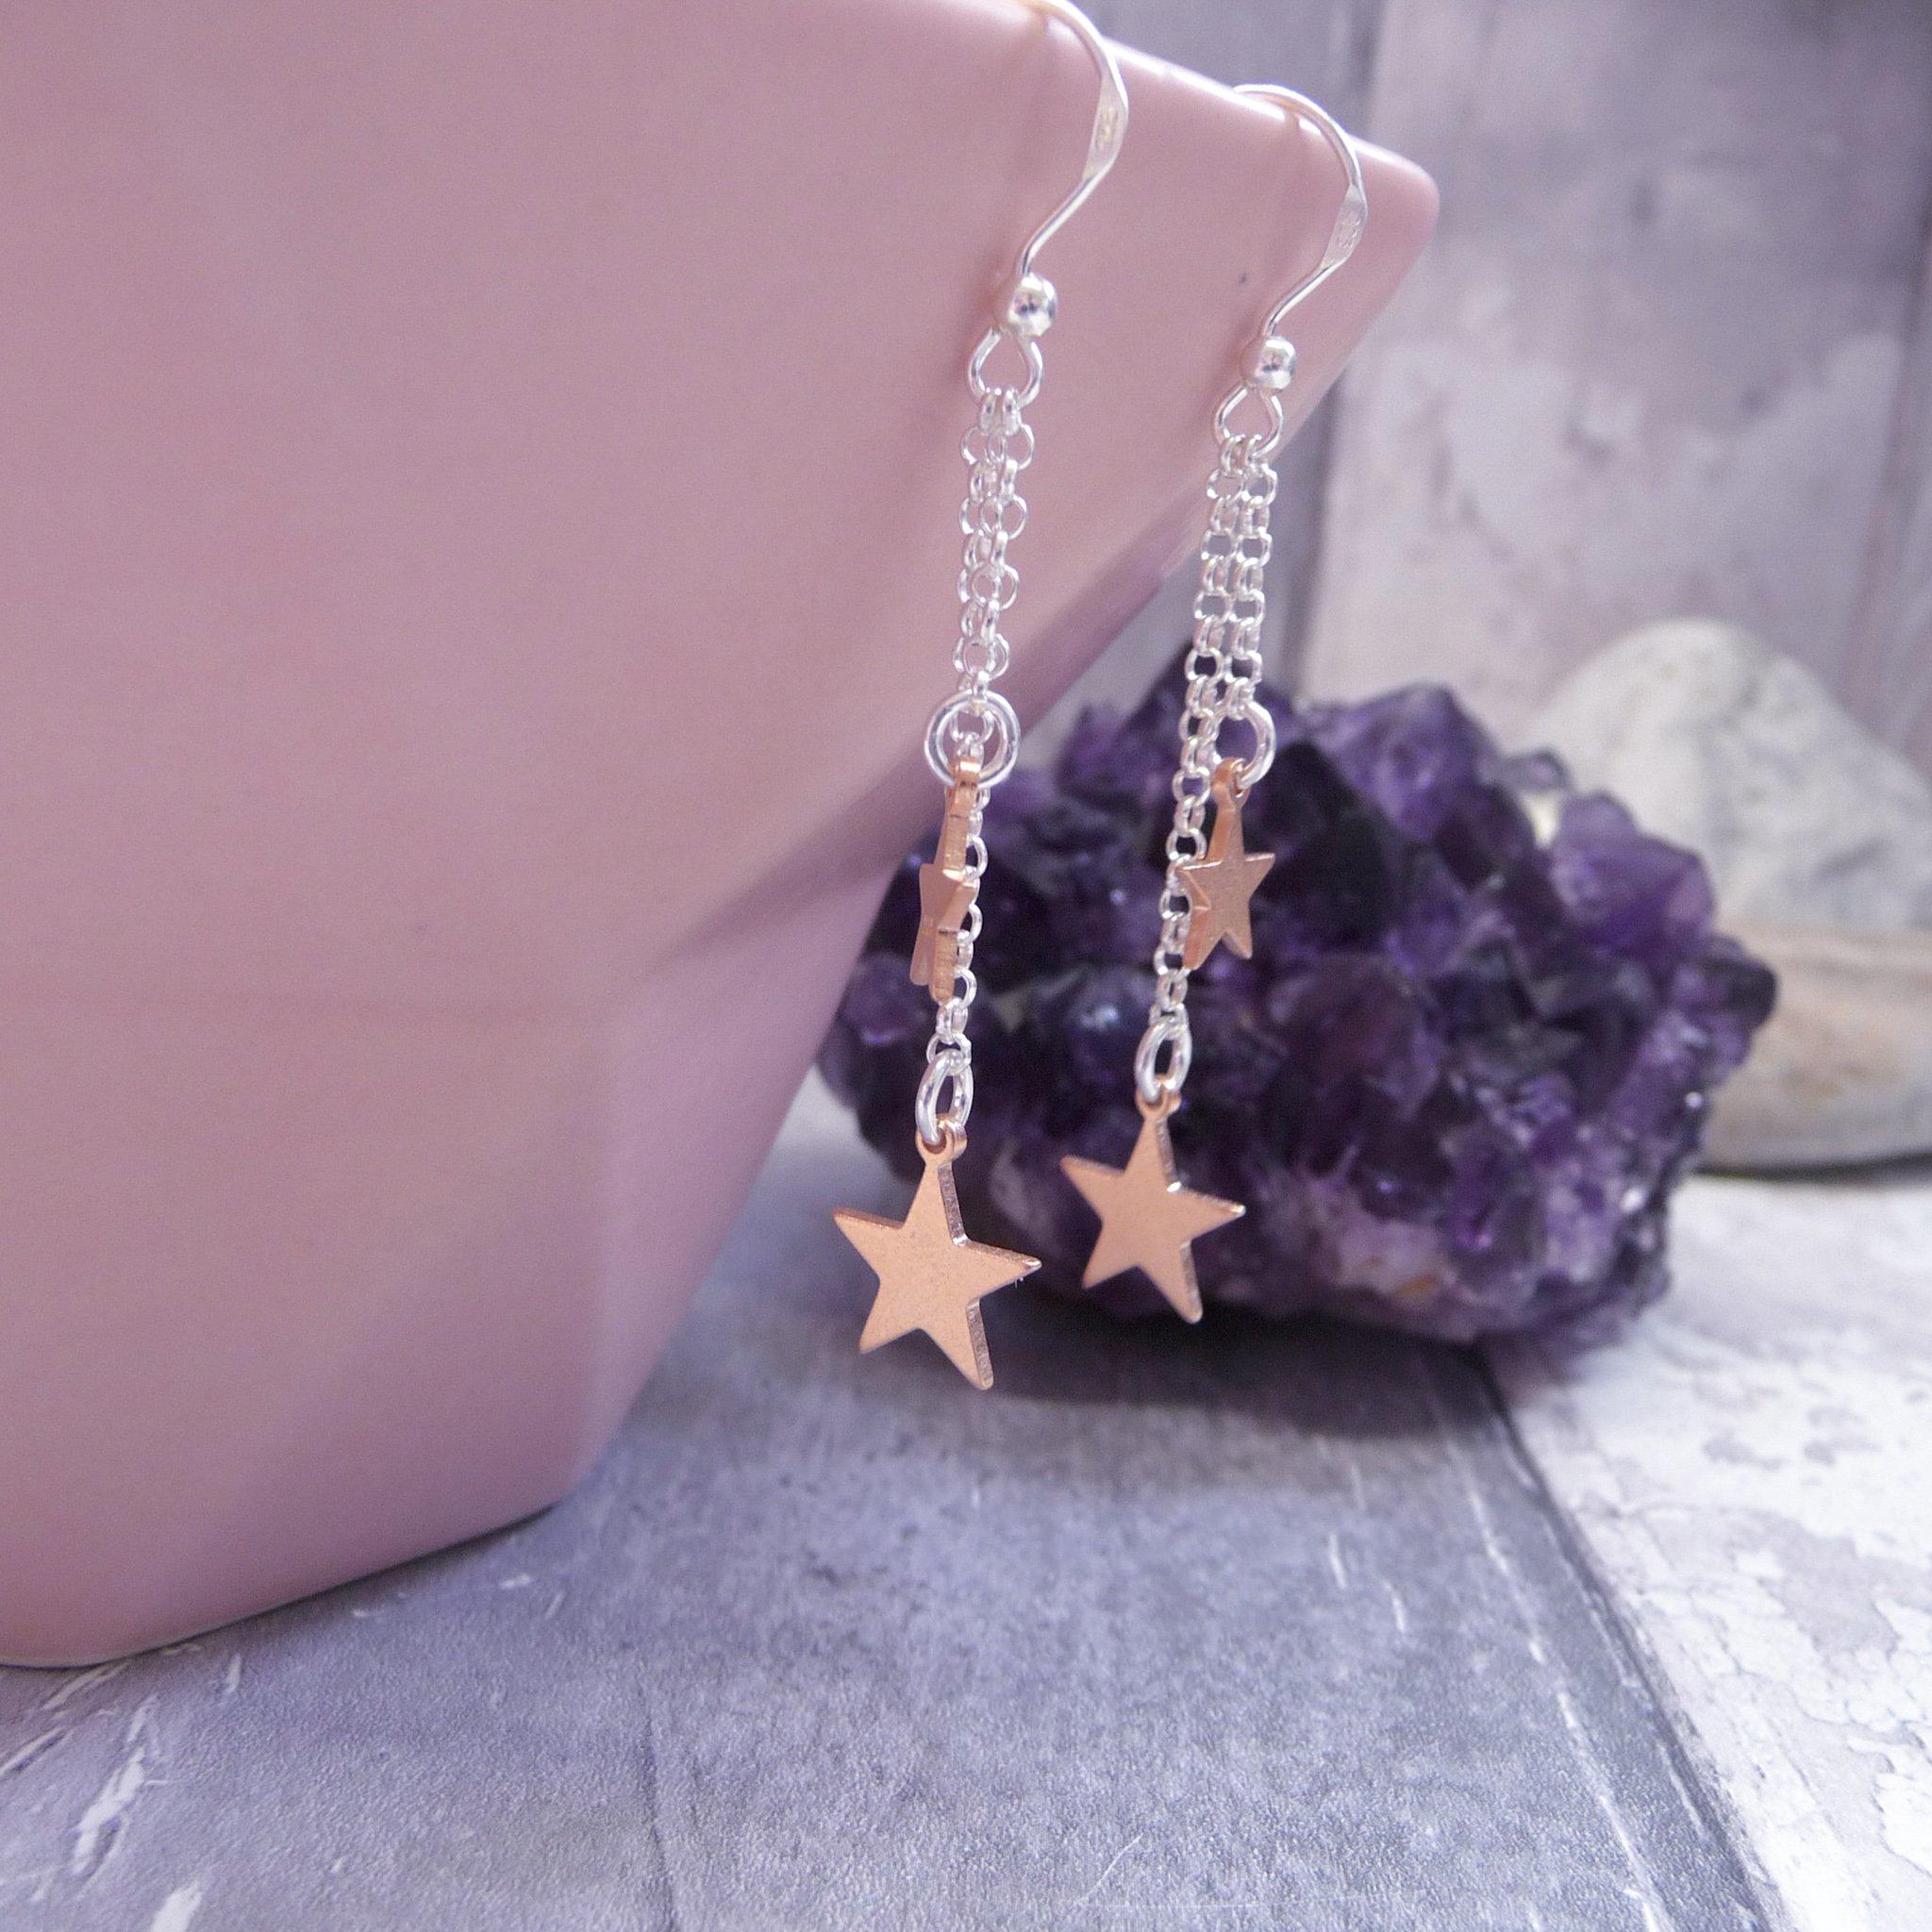 Handmade Rose Gold Filled Star Drop Earrings